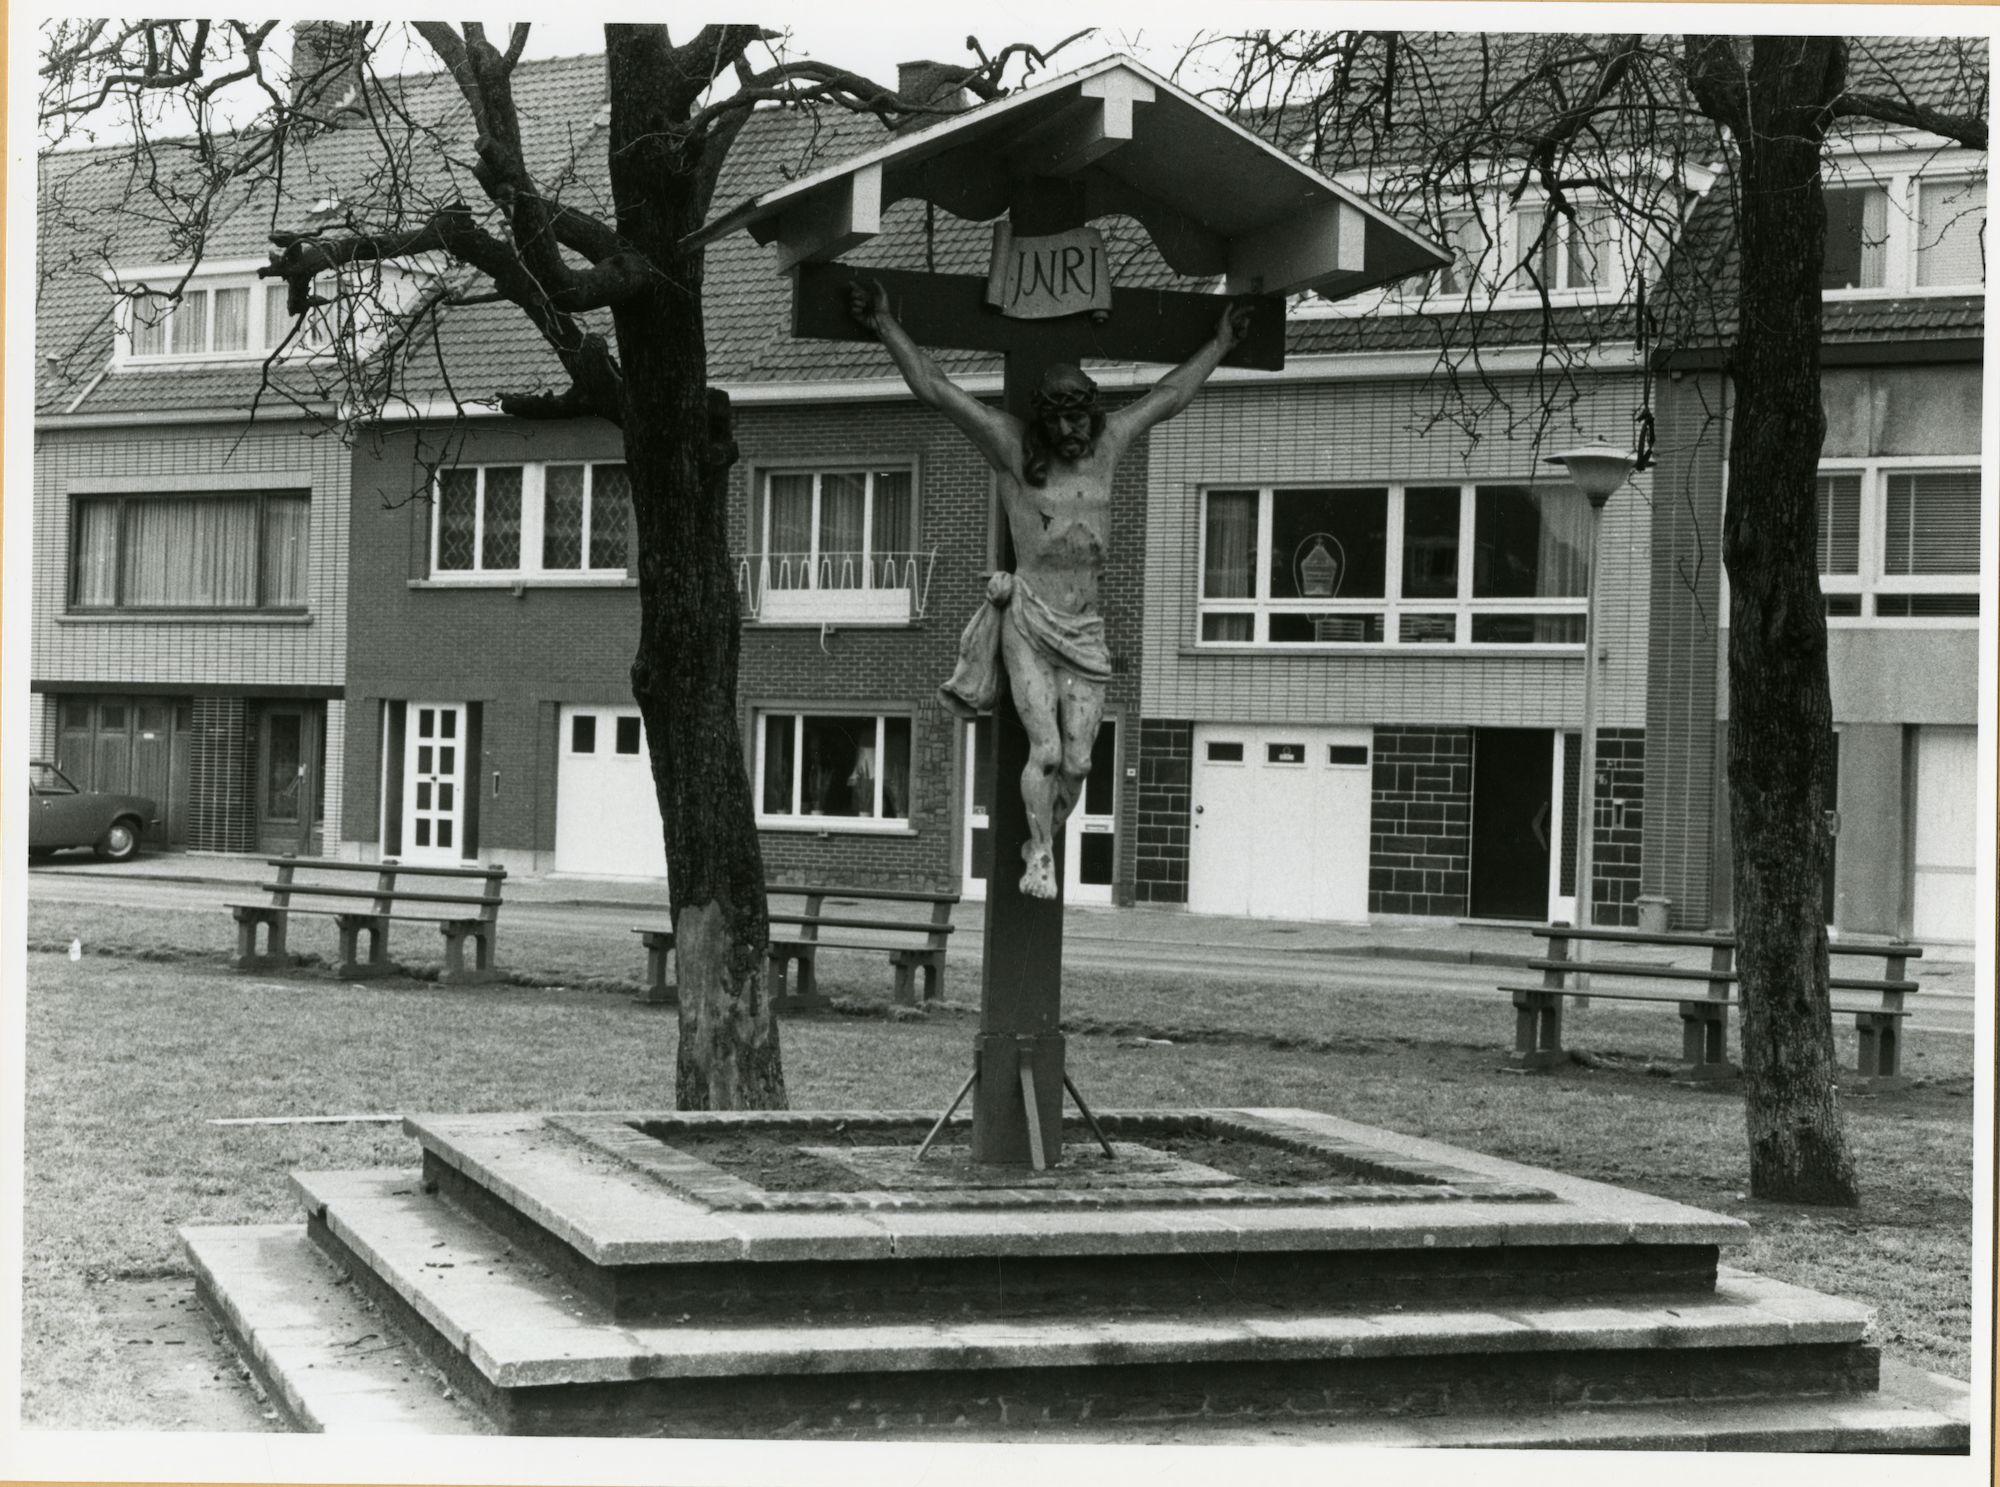 Gent: Charles de l'Epéeplein: kruis van Rooigem, 1979